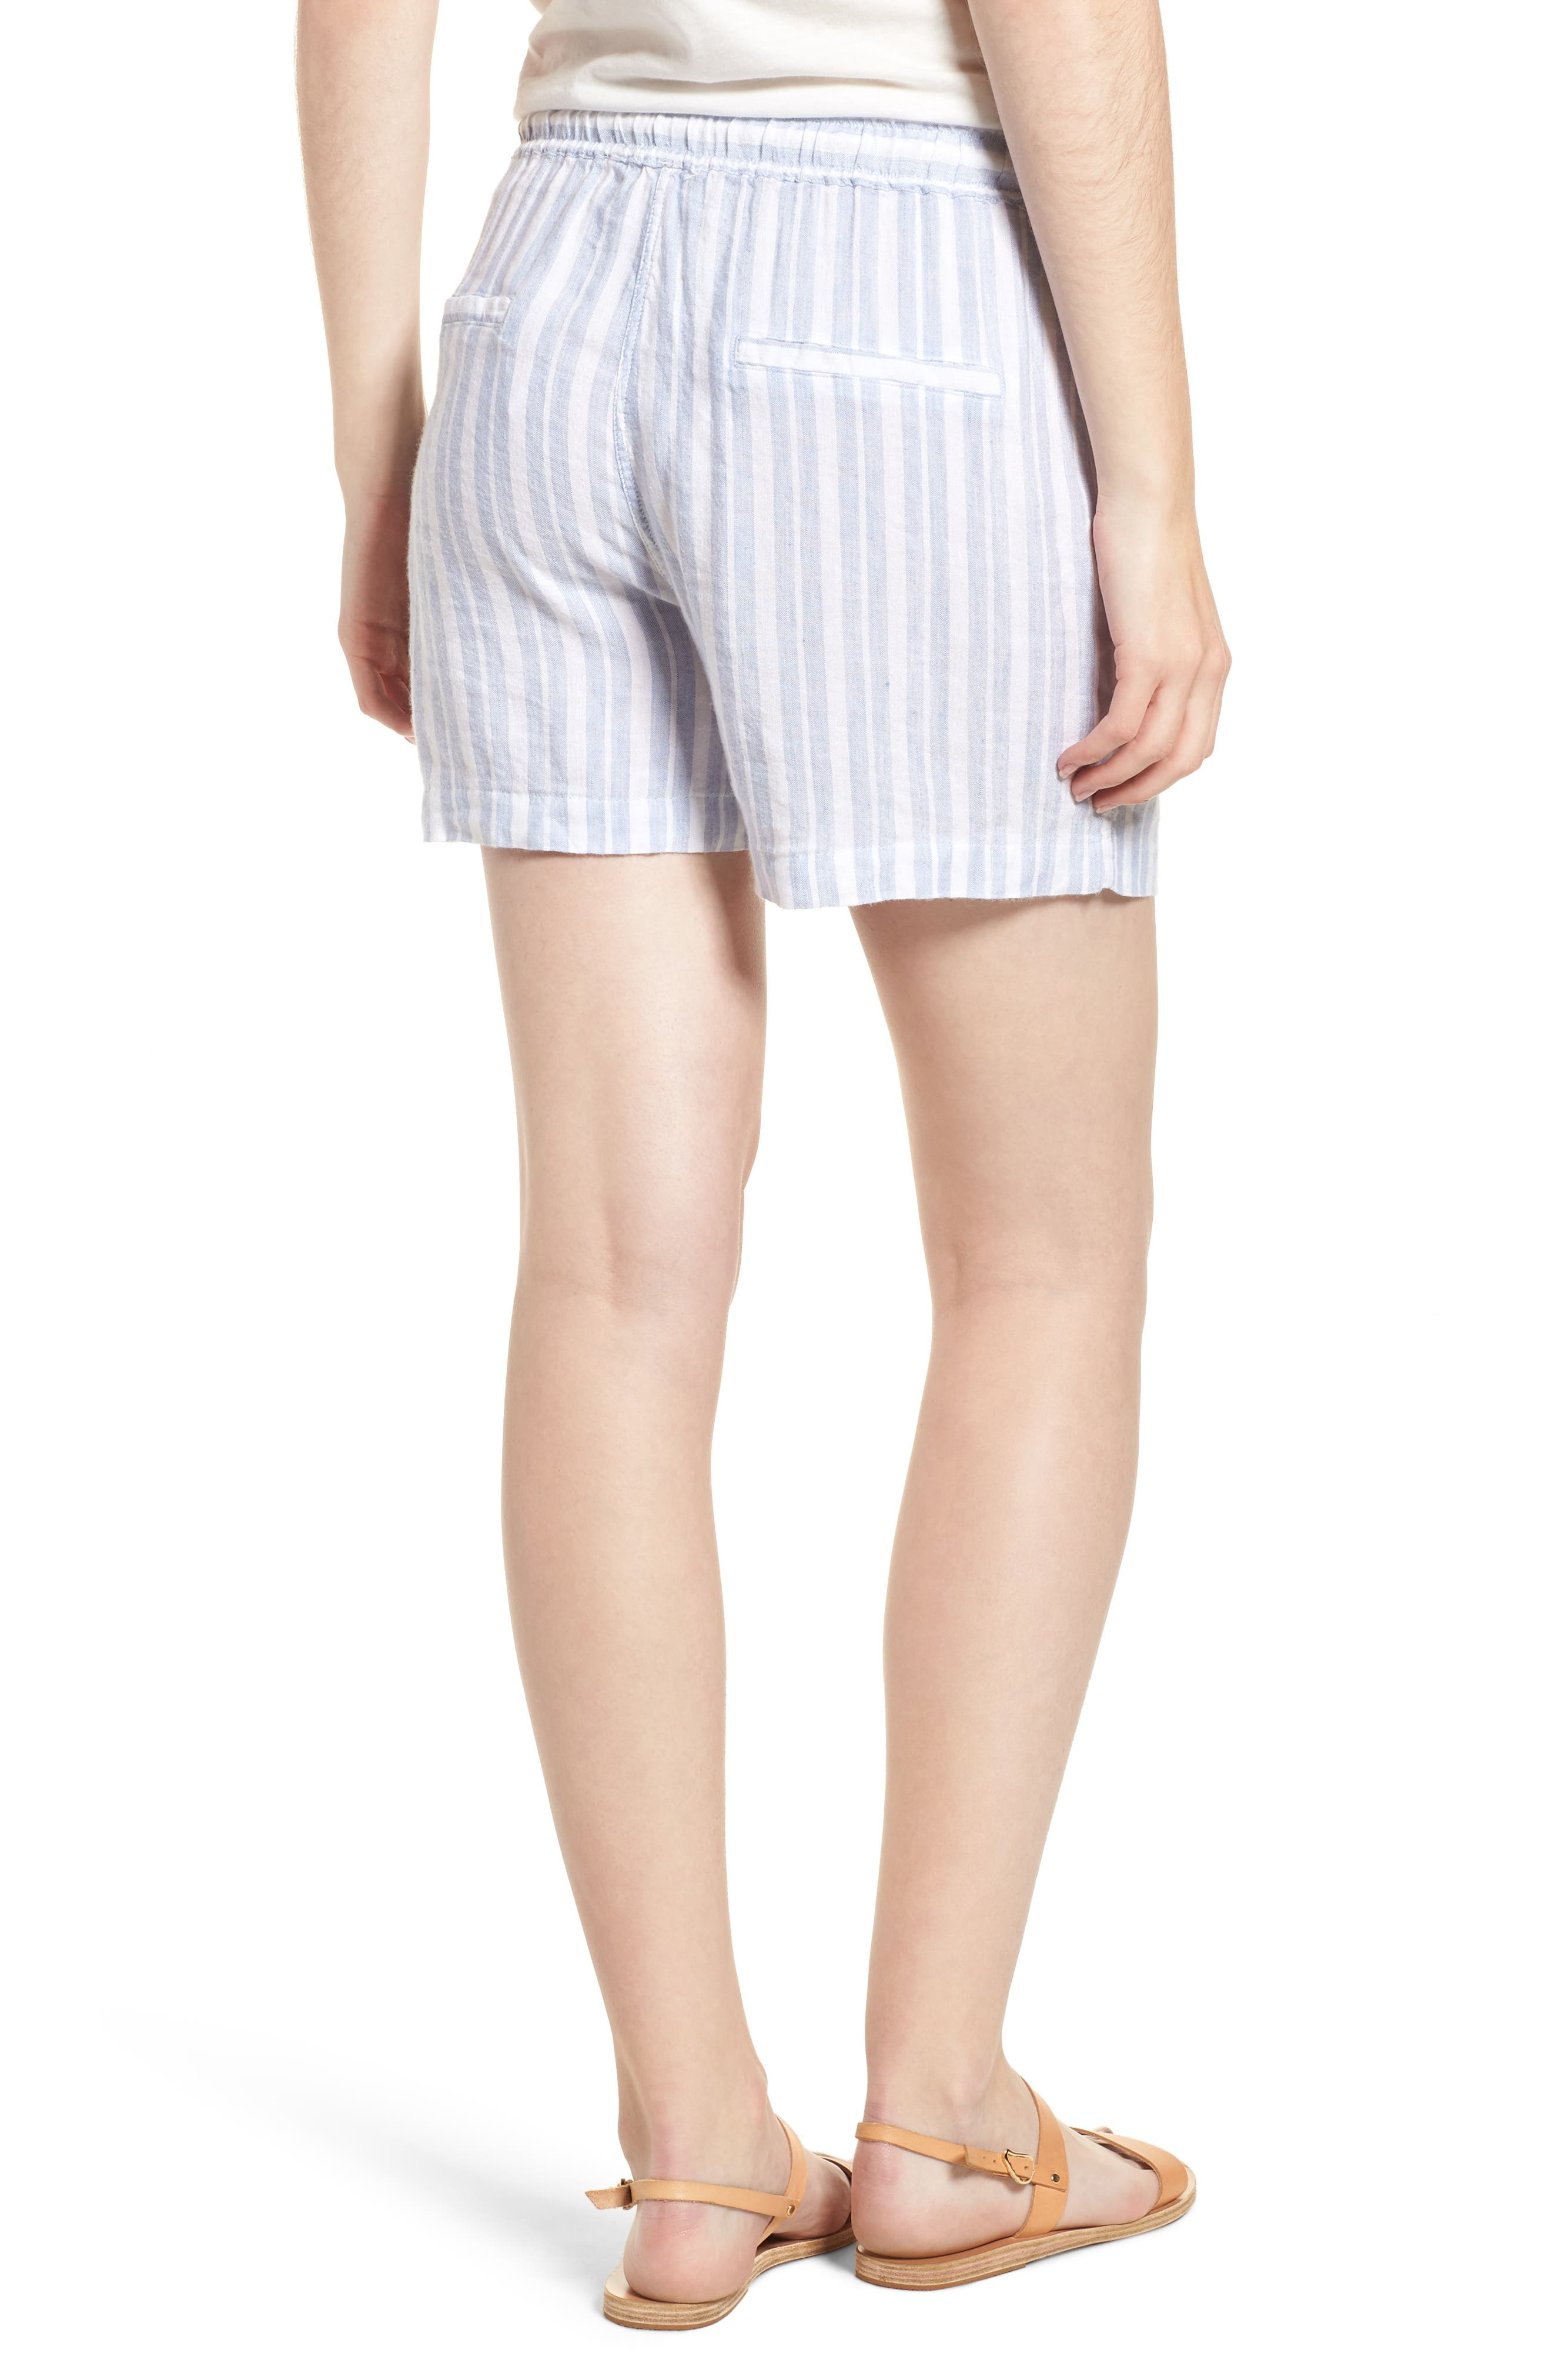 Brea Shorts,                             Alternate thumbnail 2, color,                             HOLLAND STRIPE